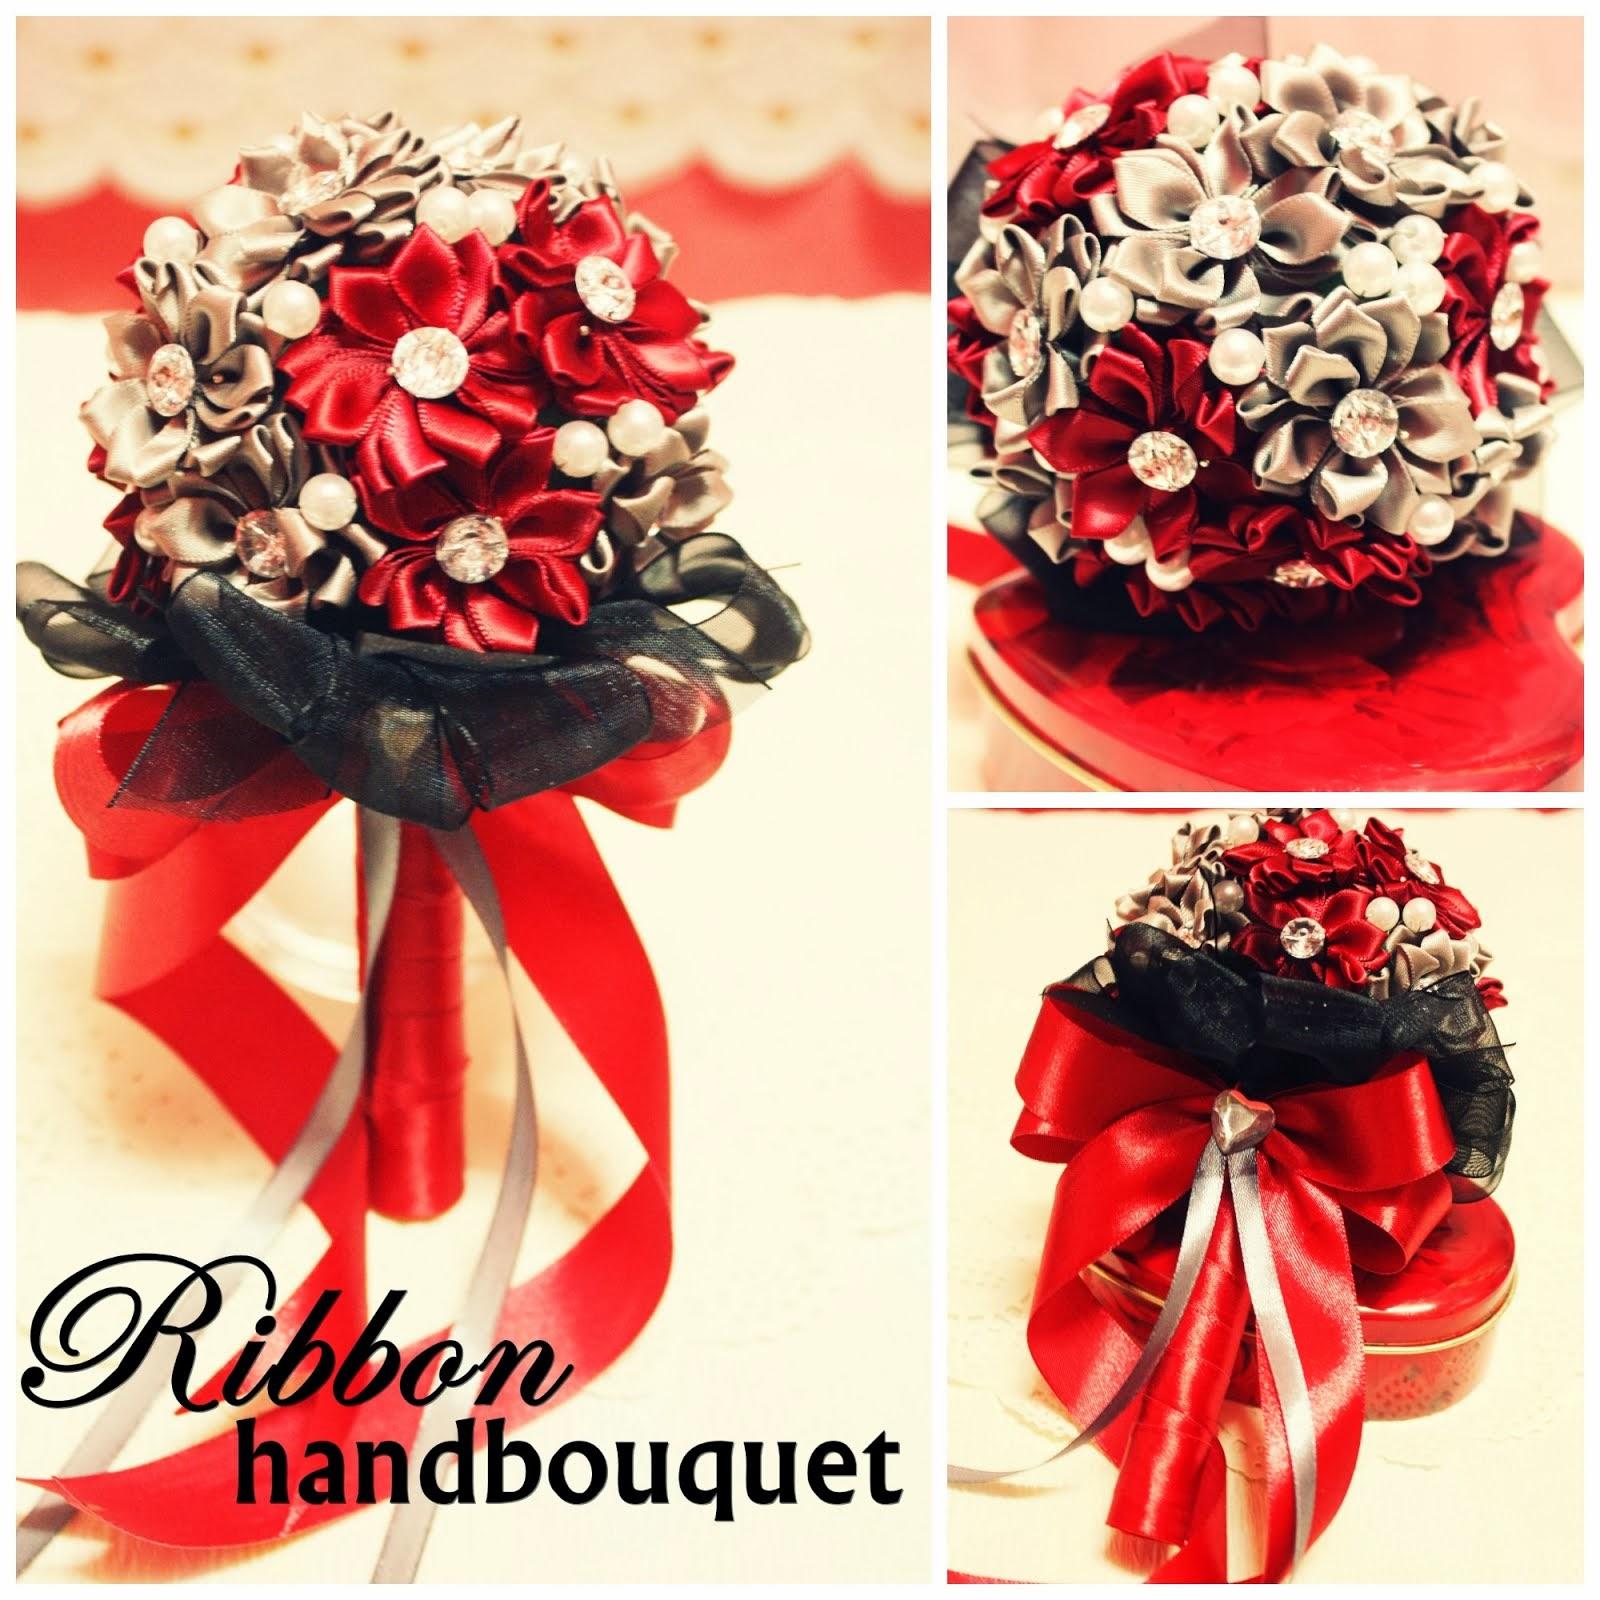 HandBouquet Promotion!!!